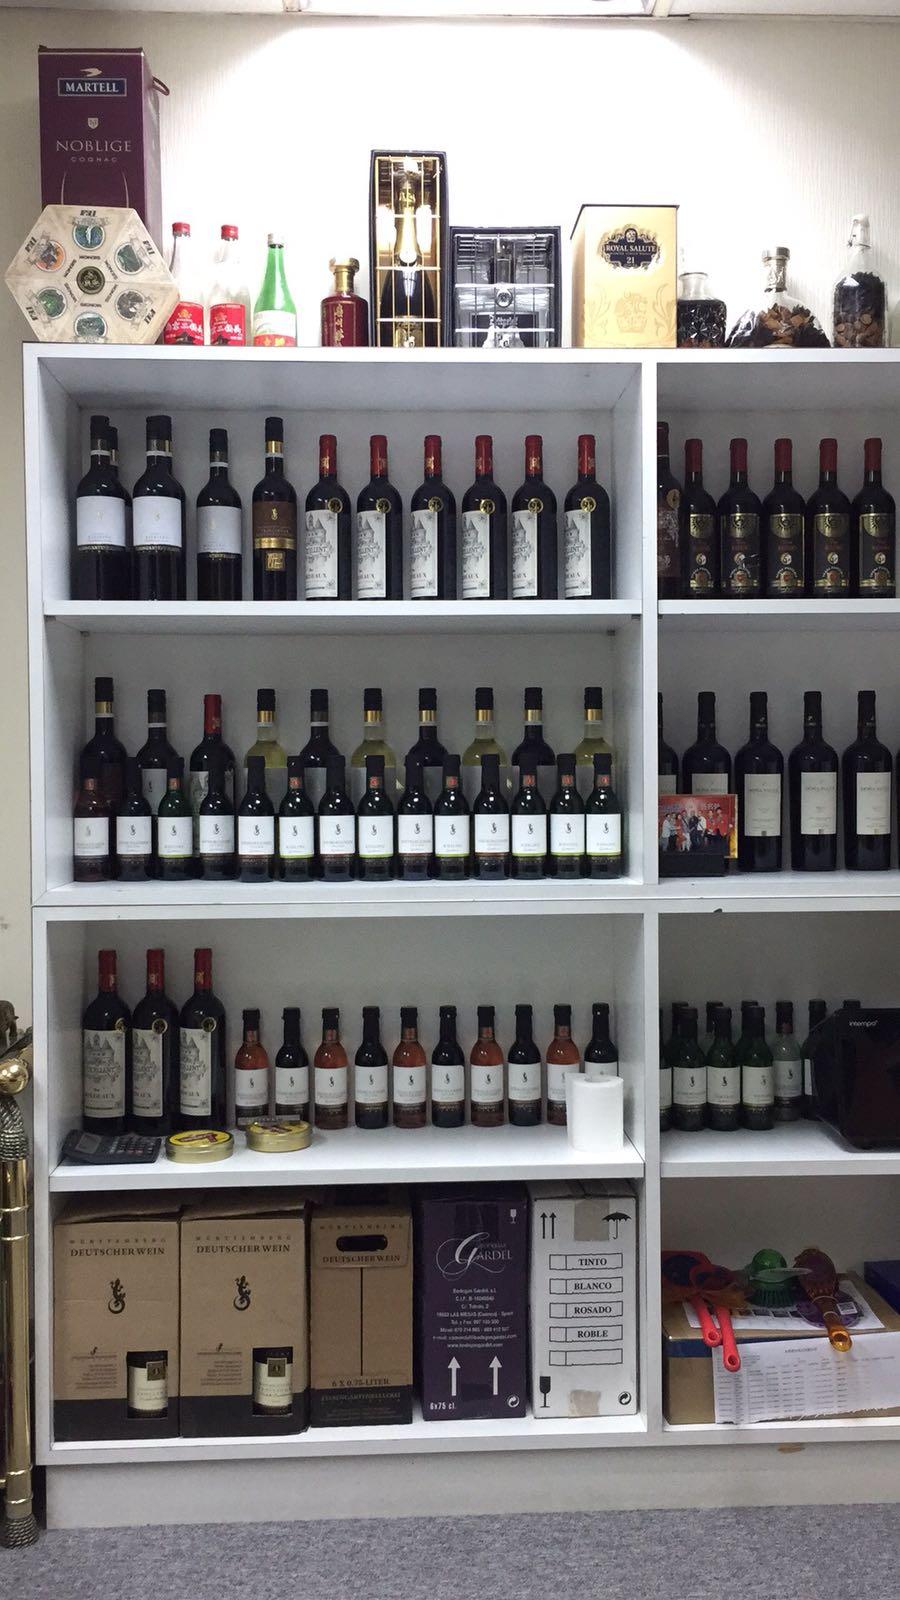 MARTELL NOBLIGE ROYAL SALUT 21 DEUTSCHERWEIN DEUTSCHERWEIN ARDEL TINIO BLANCO ROSADO ROBLE 6x75c1,liquor store,product,shelf,shelving,product